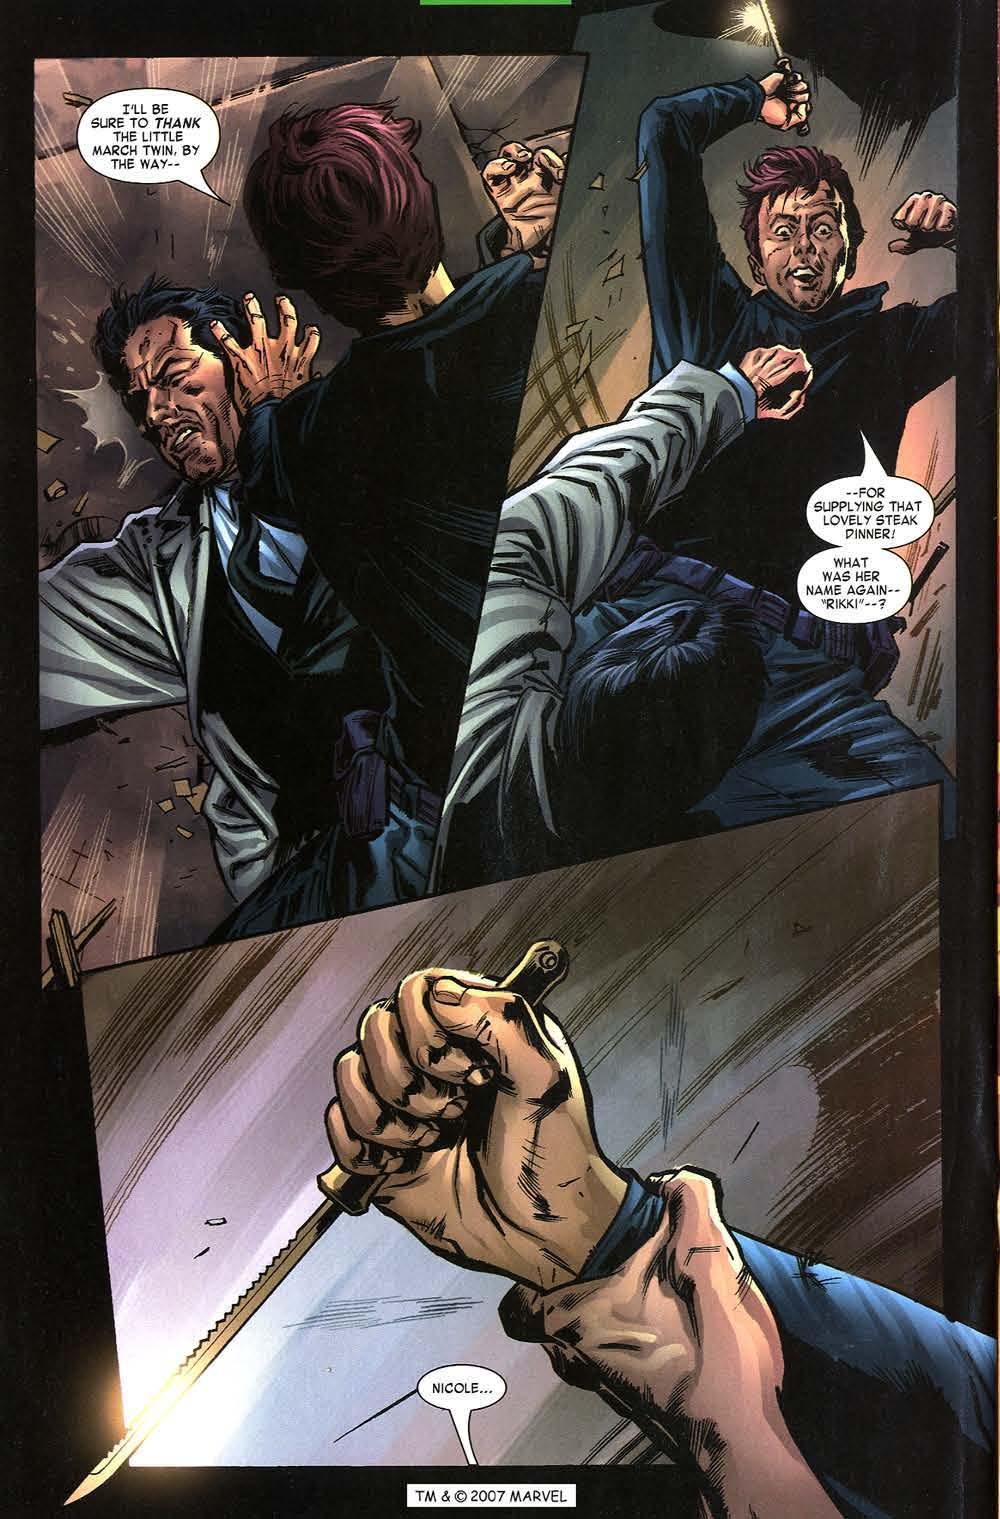 The Incredible Hulk (2000) #73 - Read The Incredible Hulk (2000